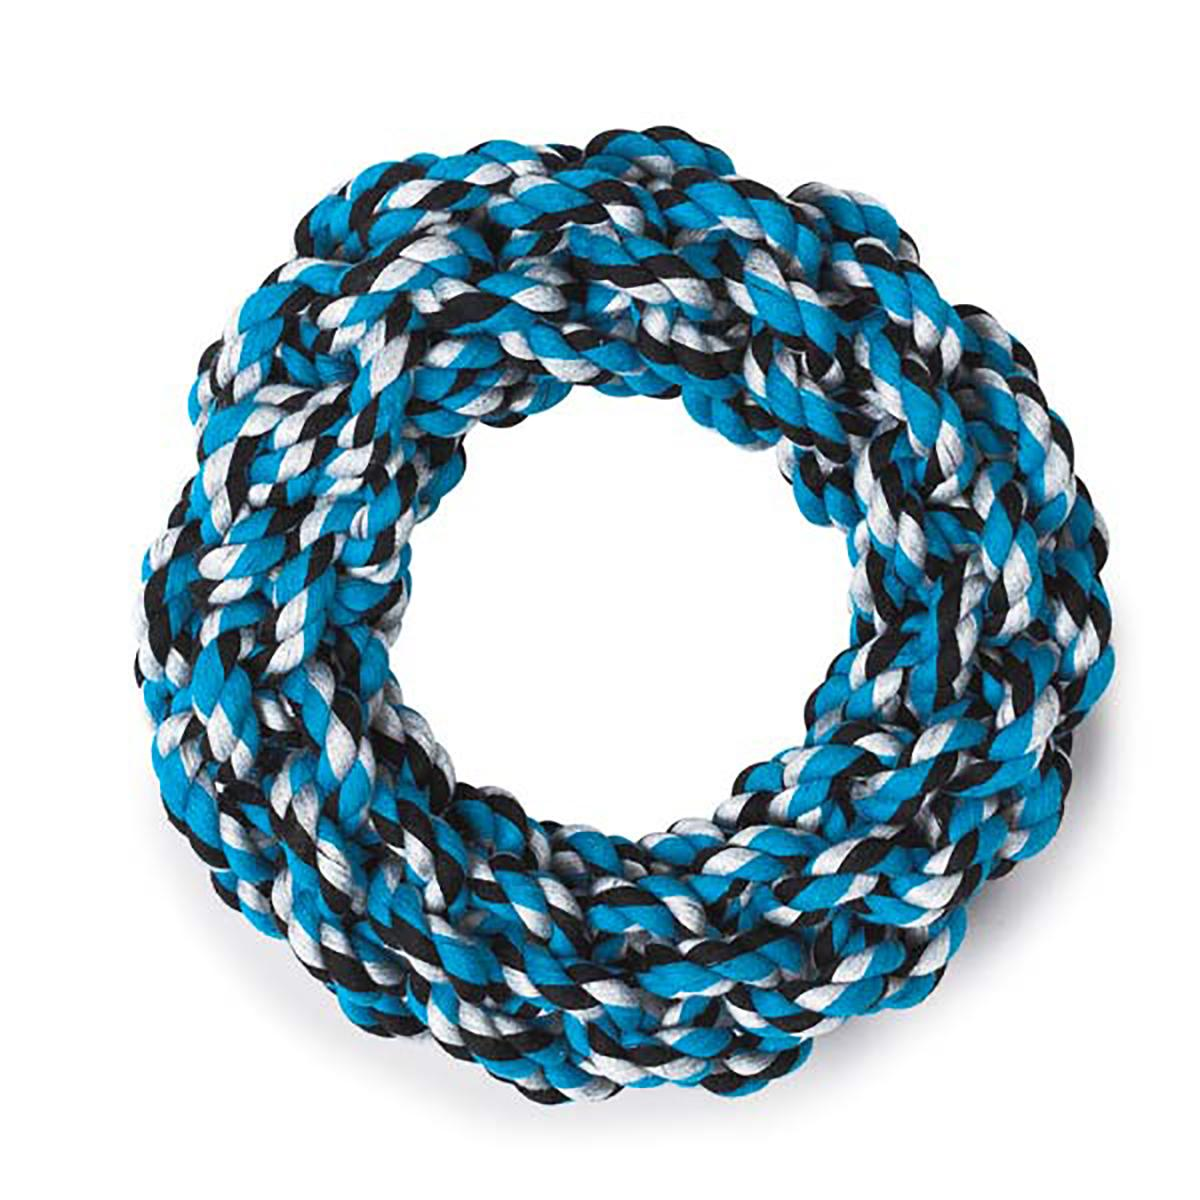 Grriggles Rope Ring Dog Toy - Blue